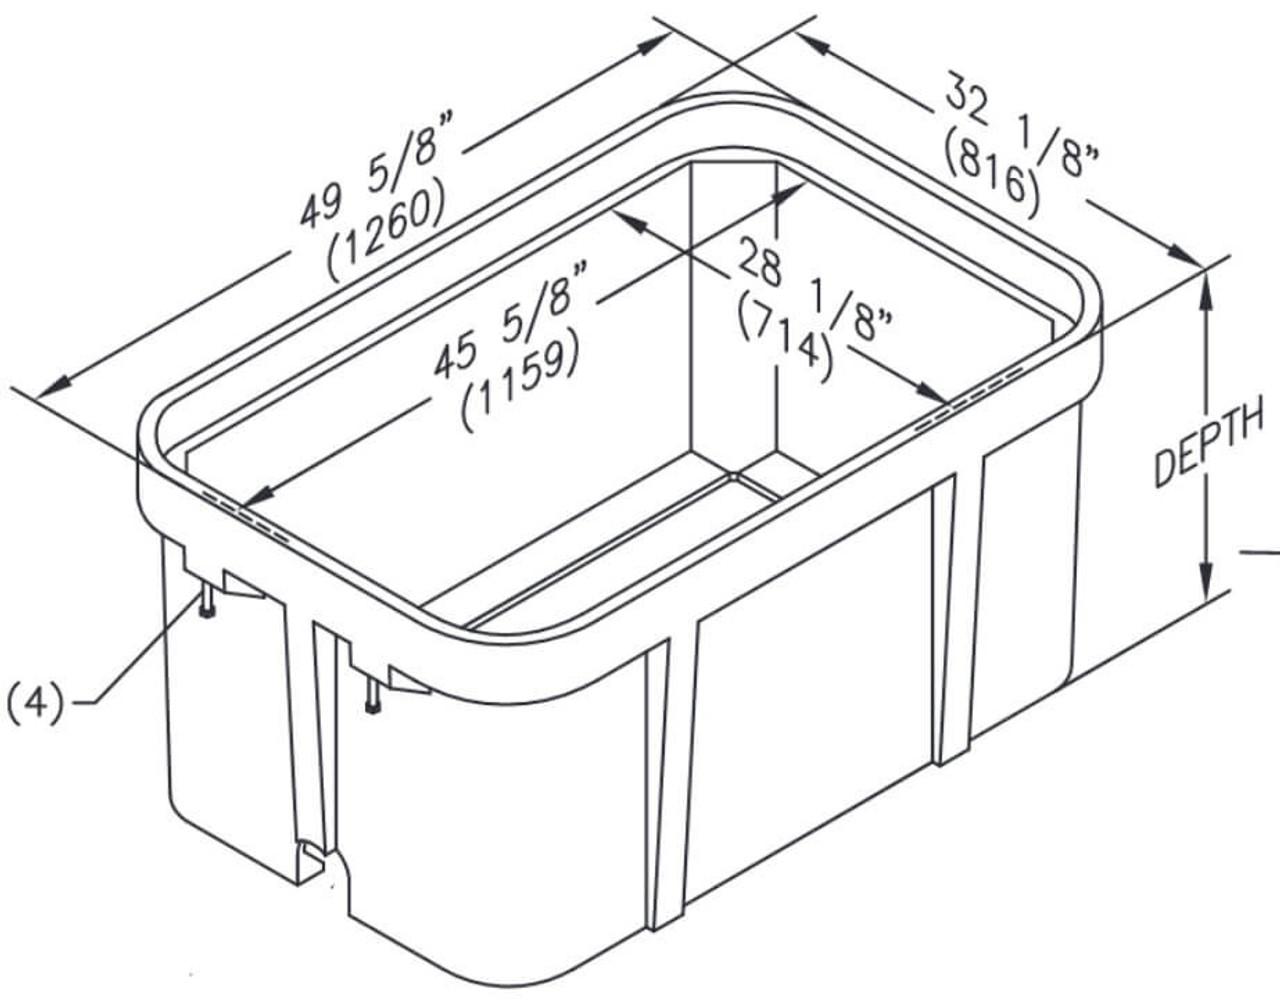 PG3048BA Quazite Box 30 X 48 - ANSI Tier 22